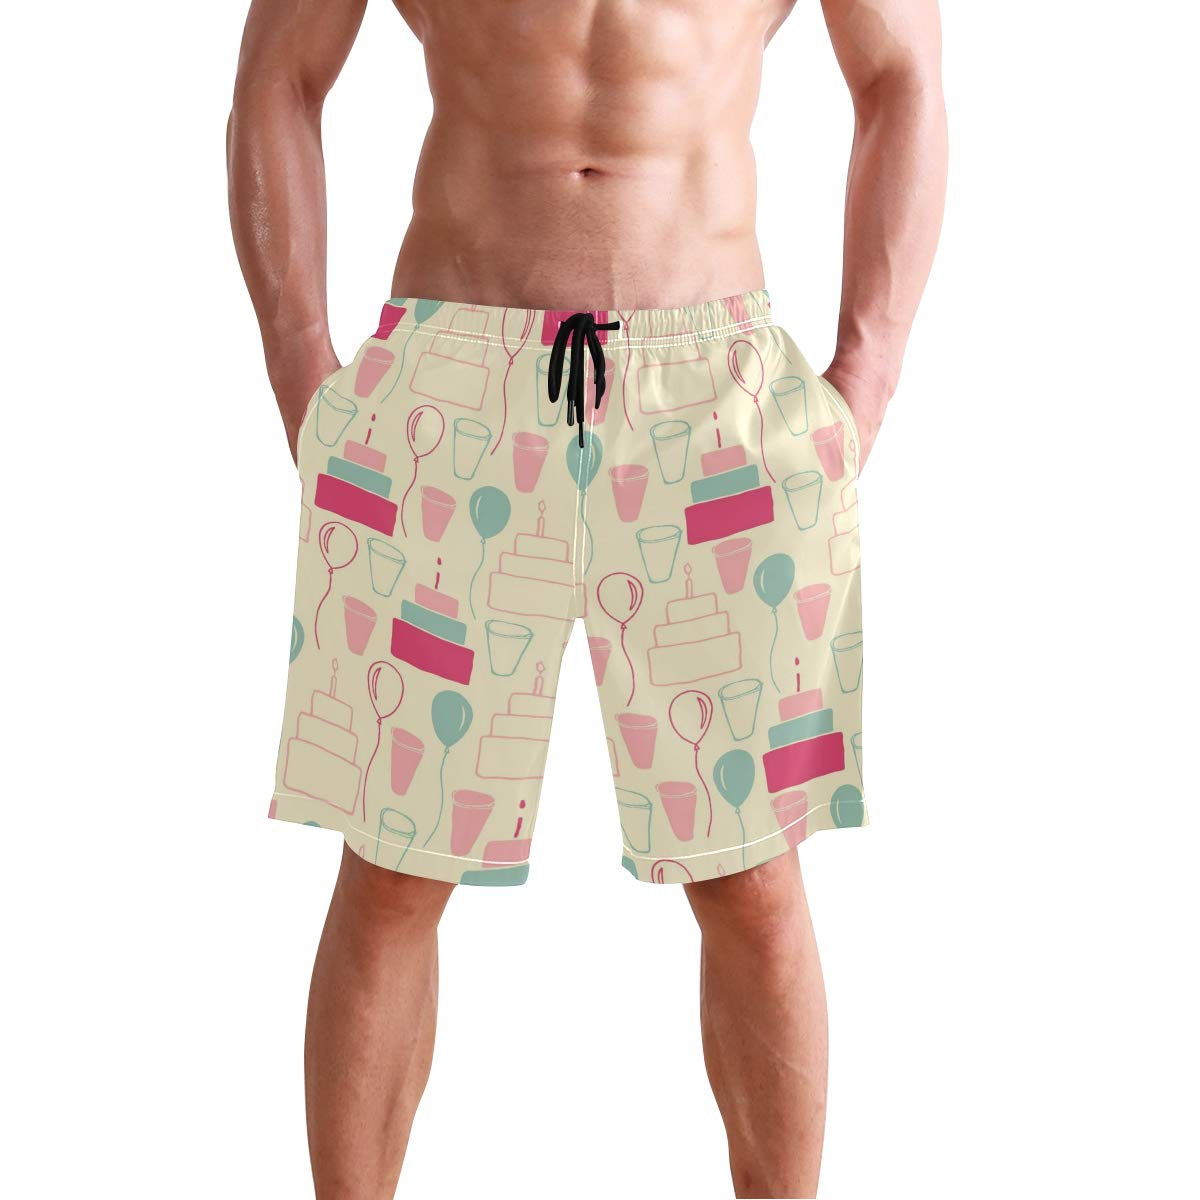 WIHVE Mens Beach Swim Trunks Balloon Cake Pattern Boxer Swimsuit Underwear Board Shorts with Pocket